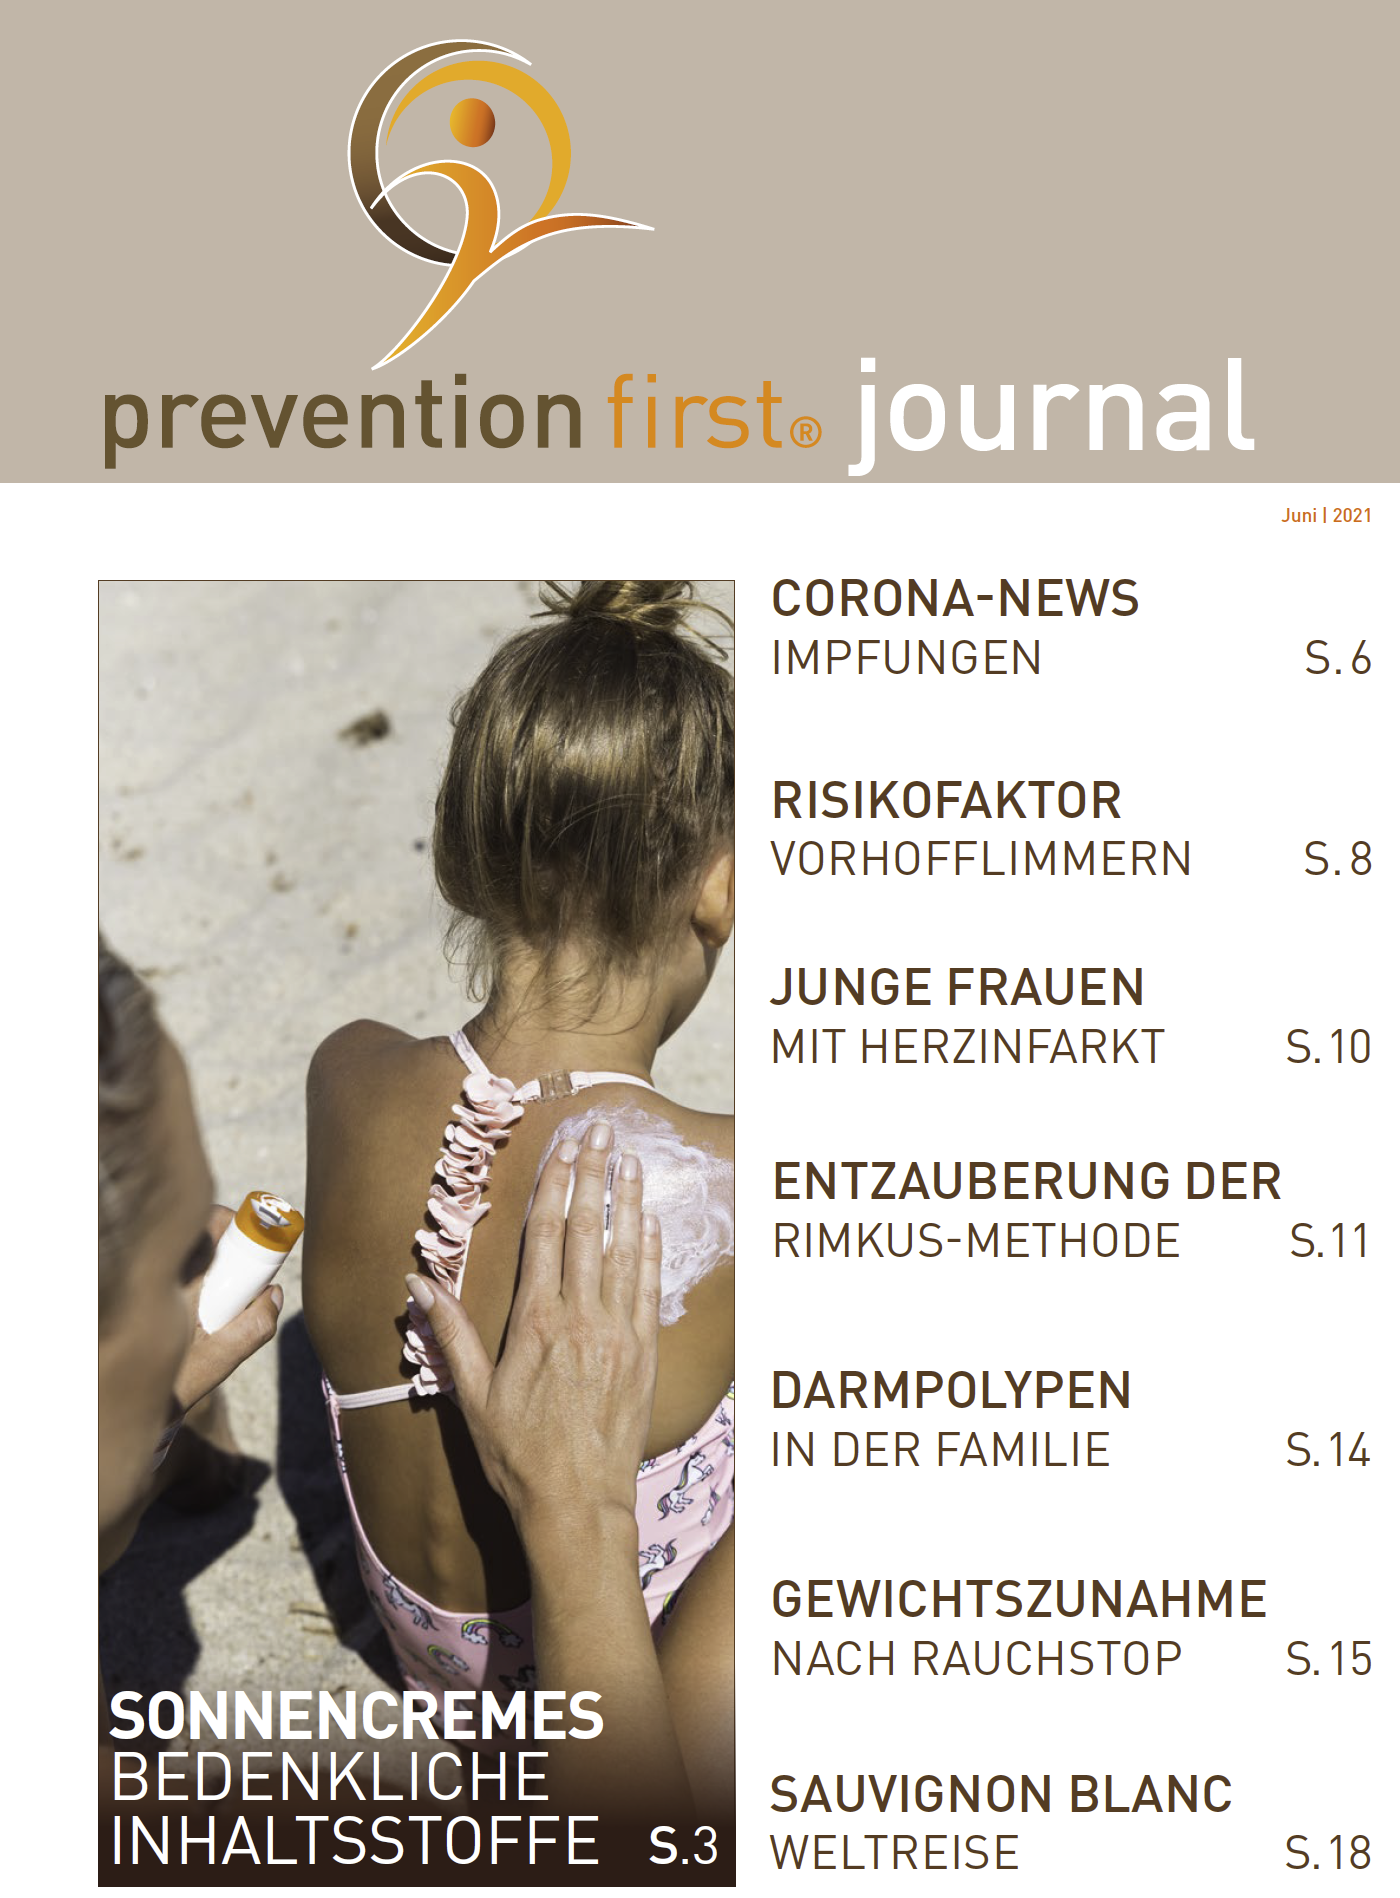 https://www.preventionfirst.de/wp-content/uploads/2021/06/Cover-Juni-2021-1.png